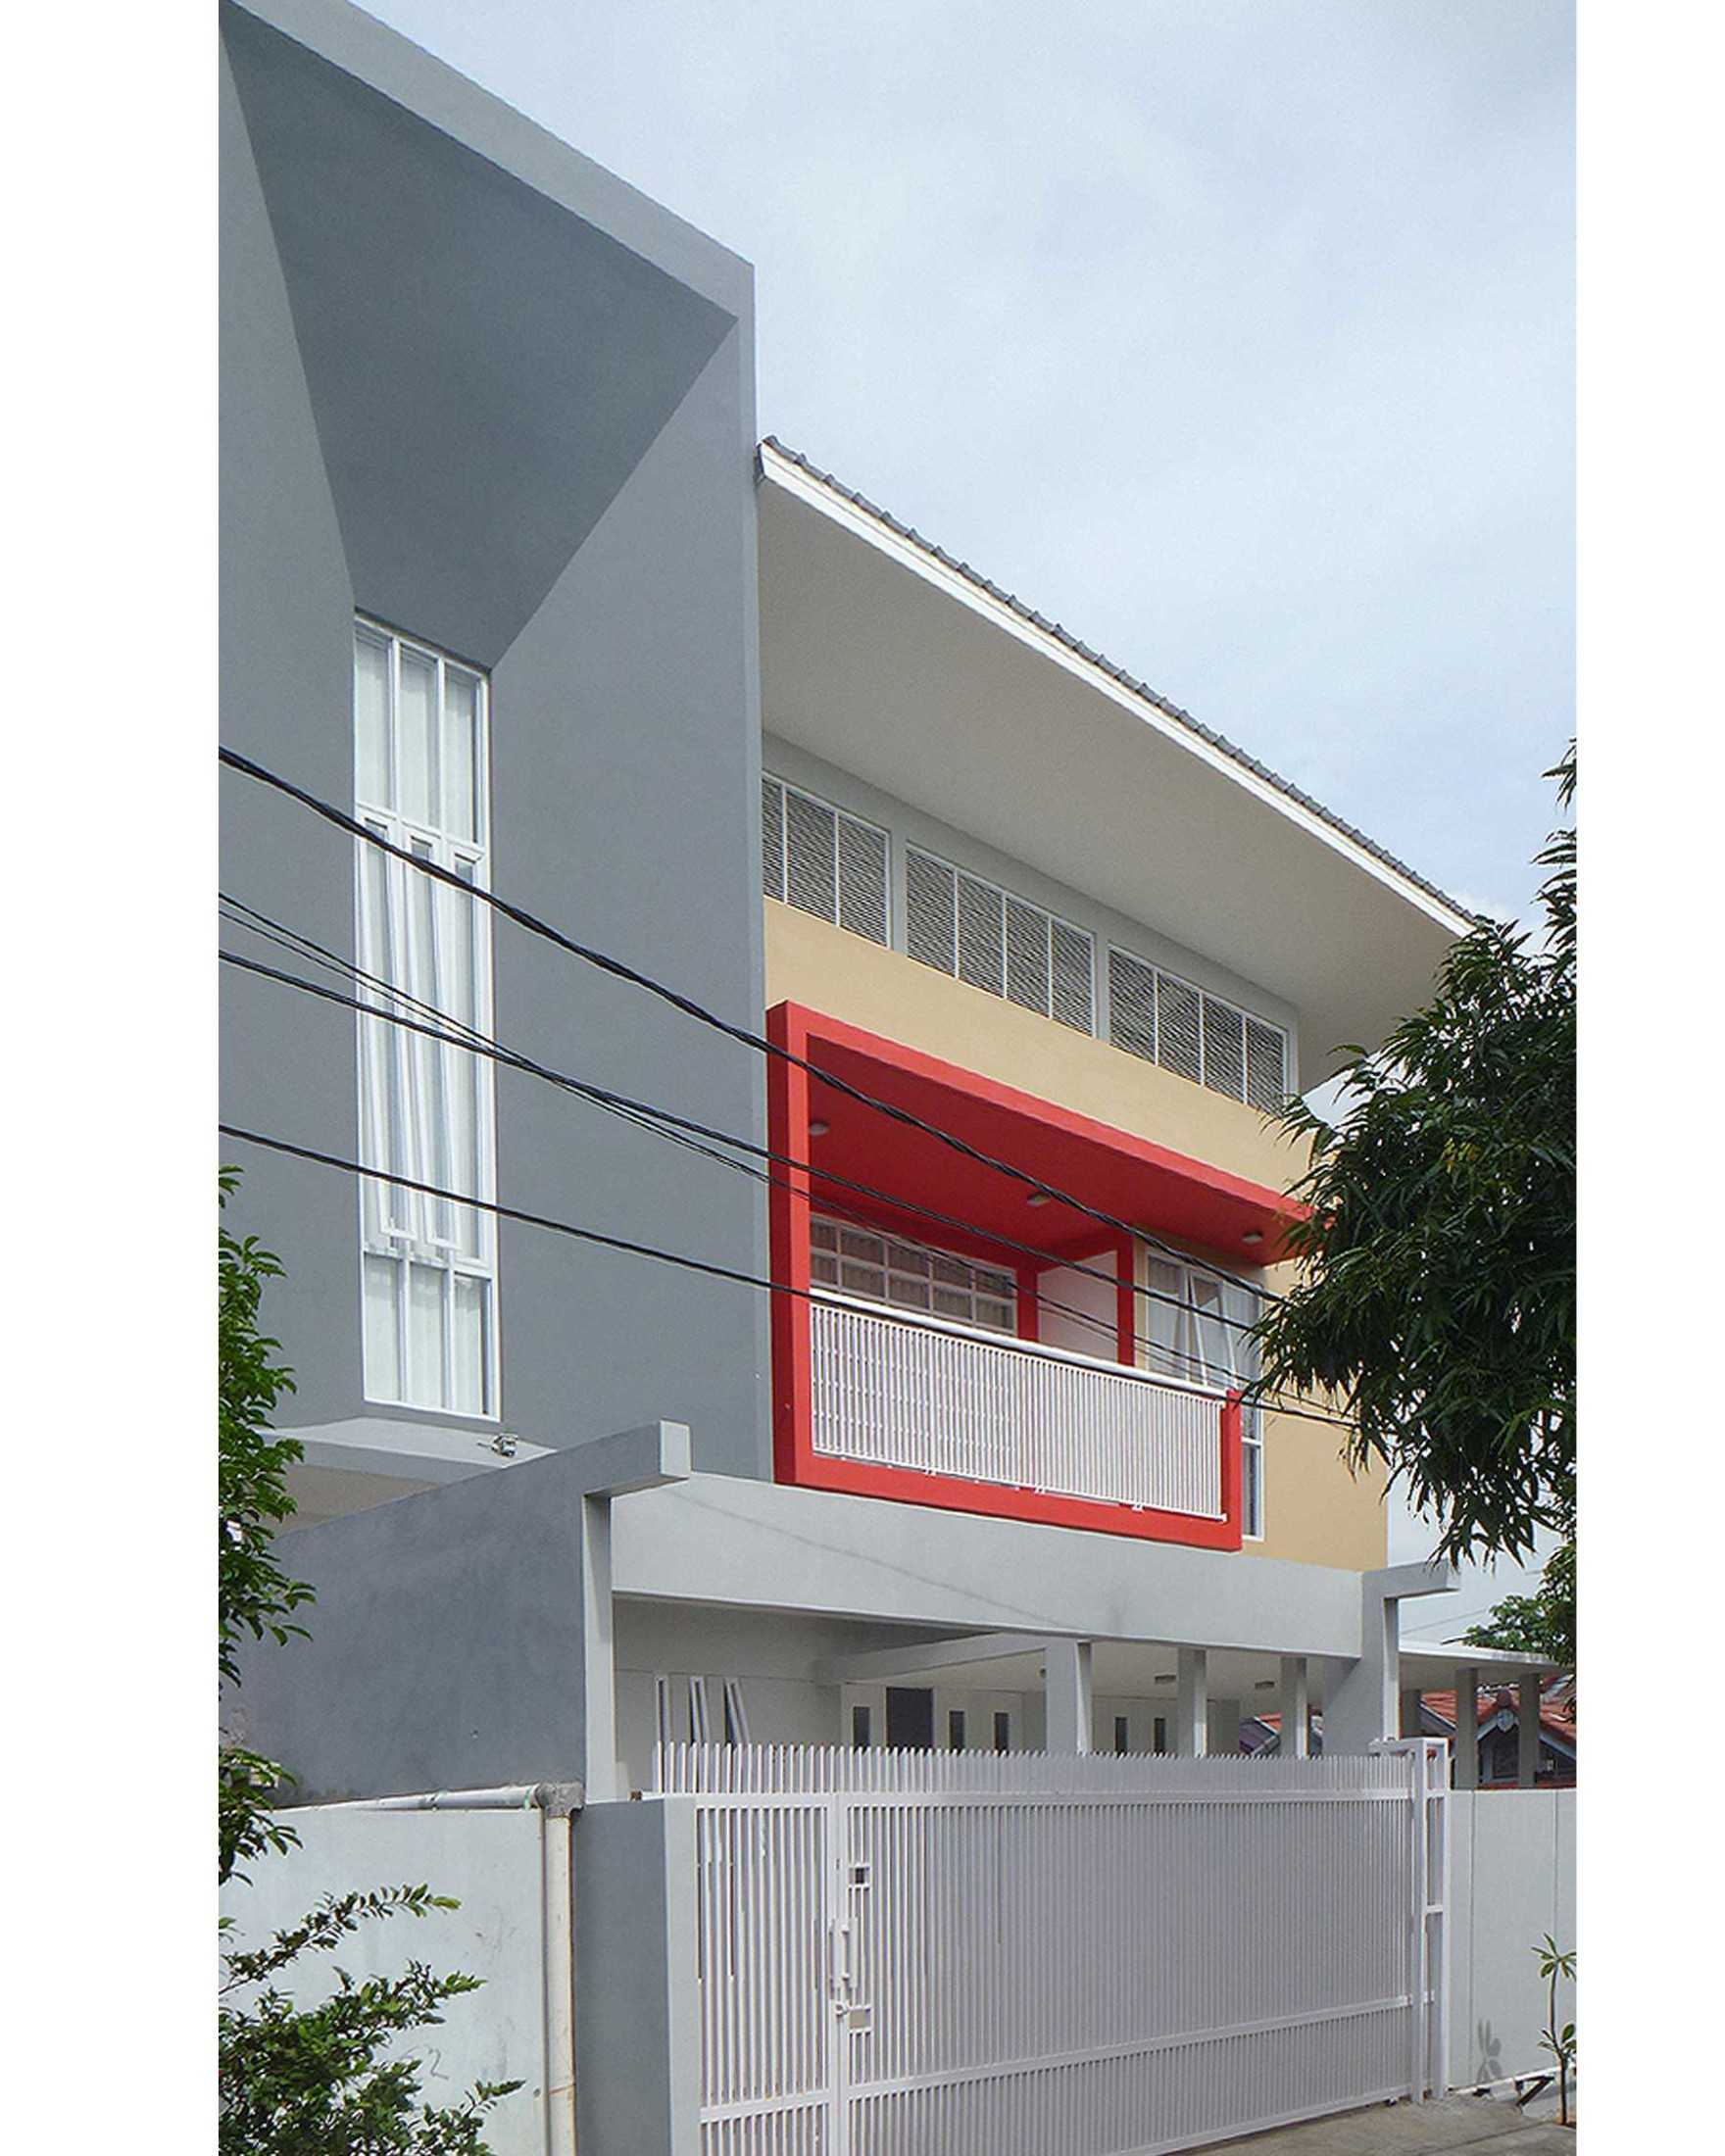 Arsitek Pramudya Rumah Bintara Bintara, Kec. Bekasi Bar., Kota Bks, Jawa Barat, Indonesia Bintara, Kec. Bekasi Bar., Kota Bks, Jawa Barat, Indonesia Arsitek-Pramudya-Rumah-Bintara  96766